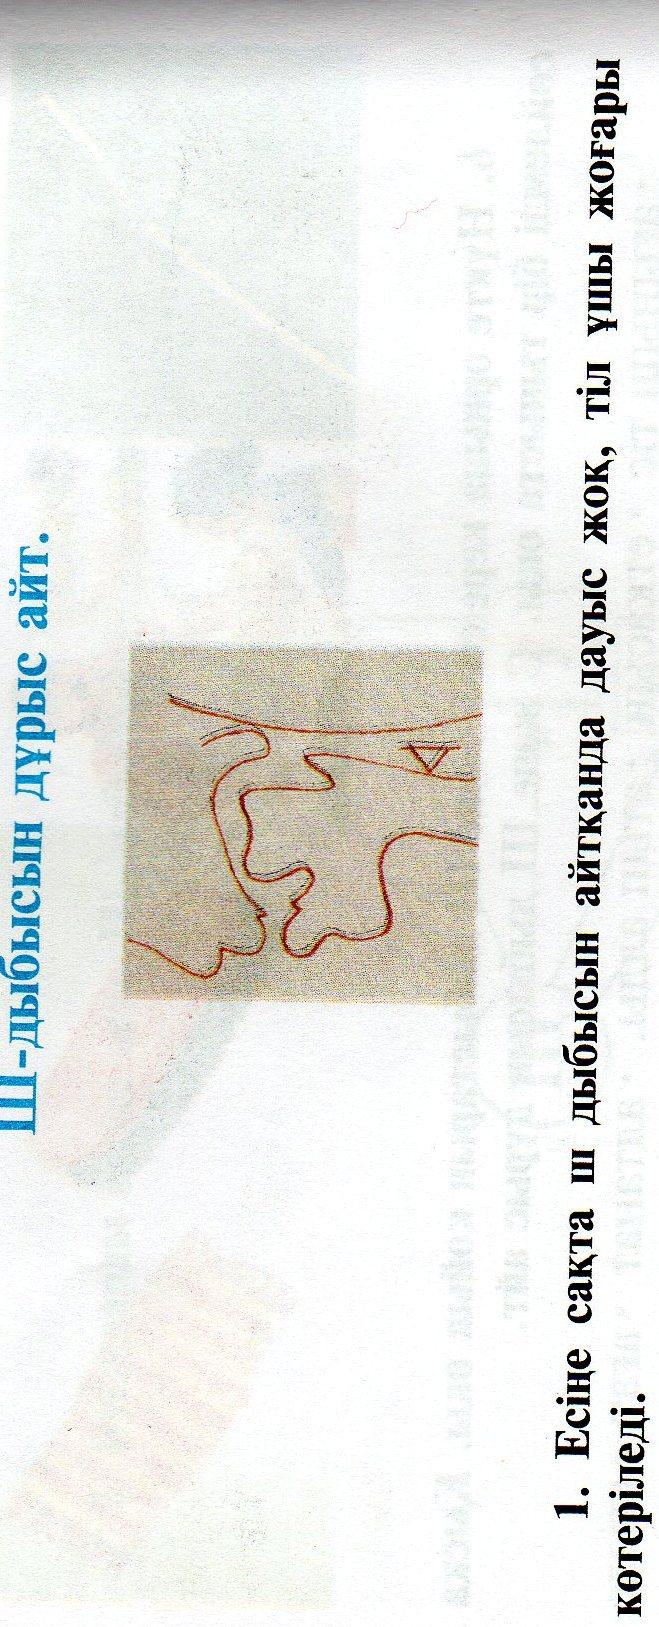 C:\Documents and Settings\Пользователь\Мои документы\Мои рисунки\img073.jpg